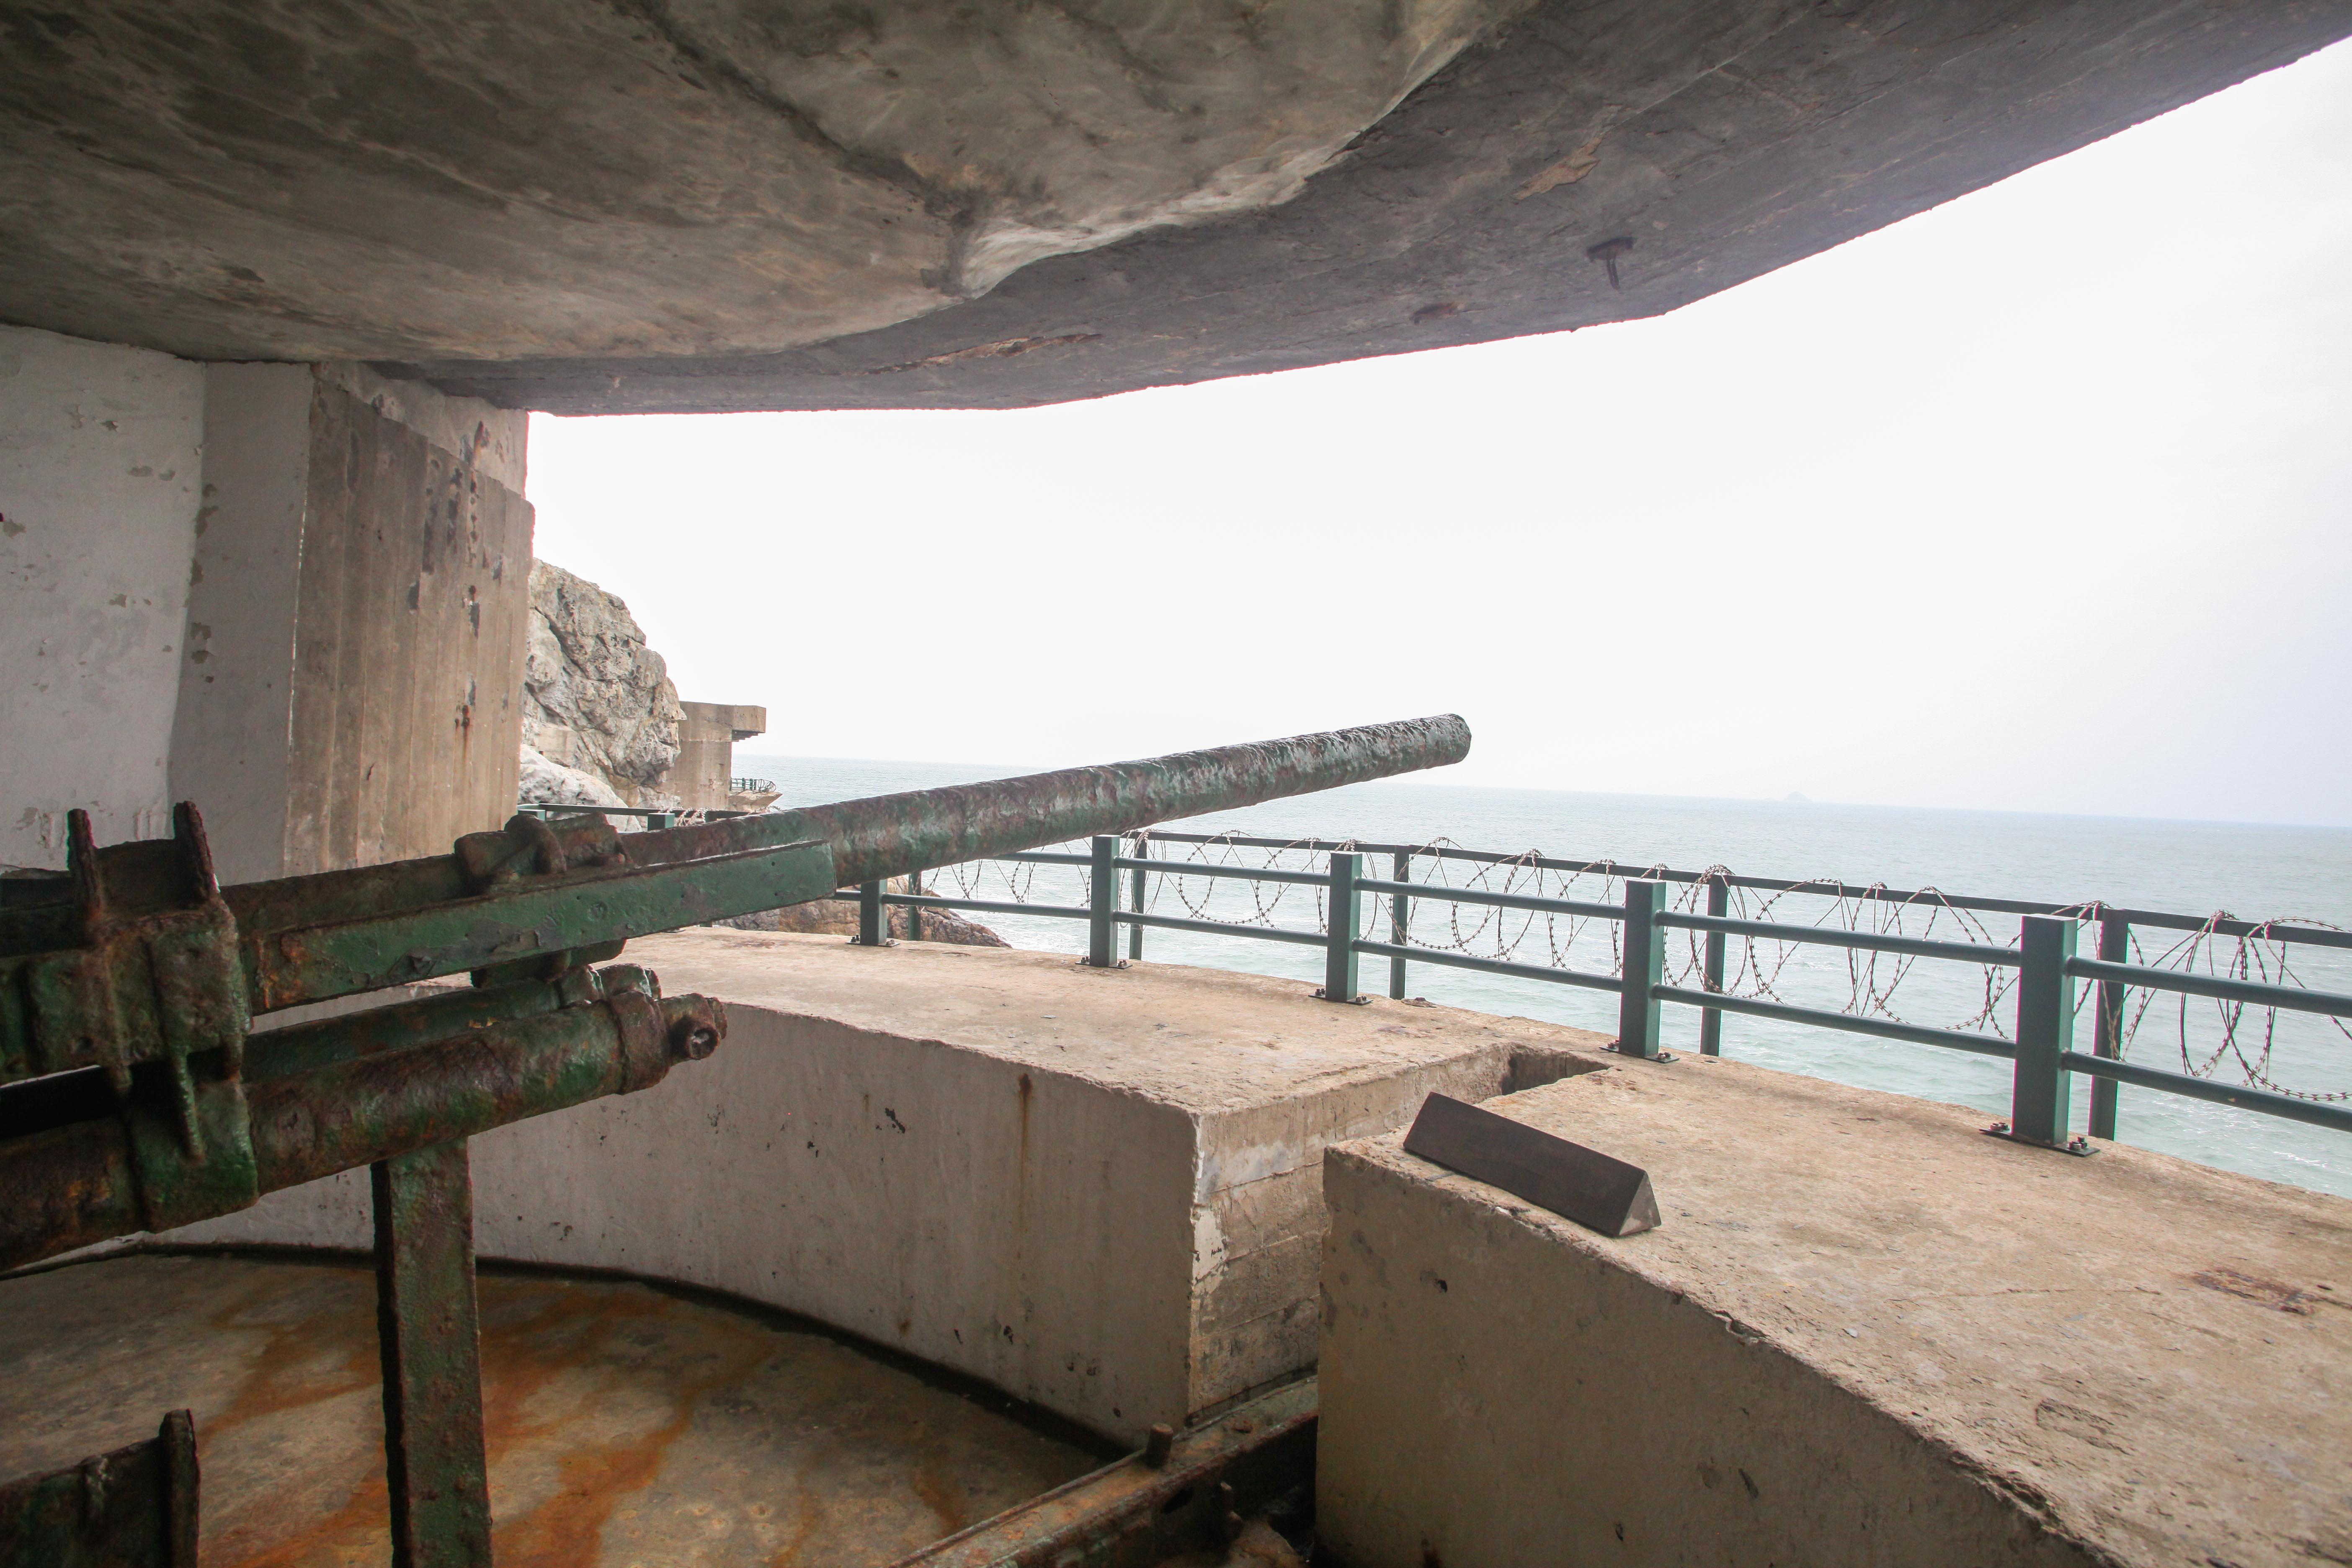 大漢拠点の砲台